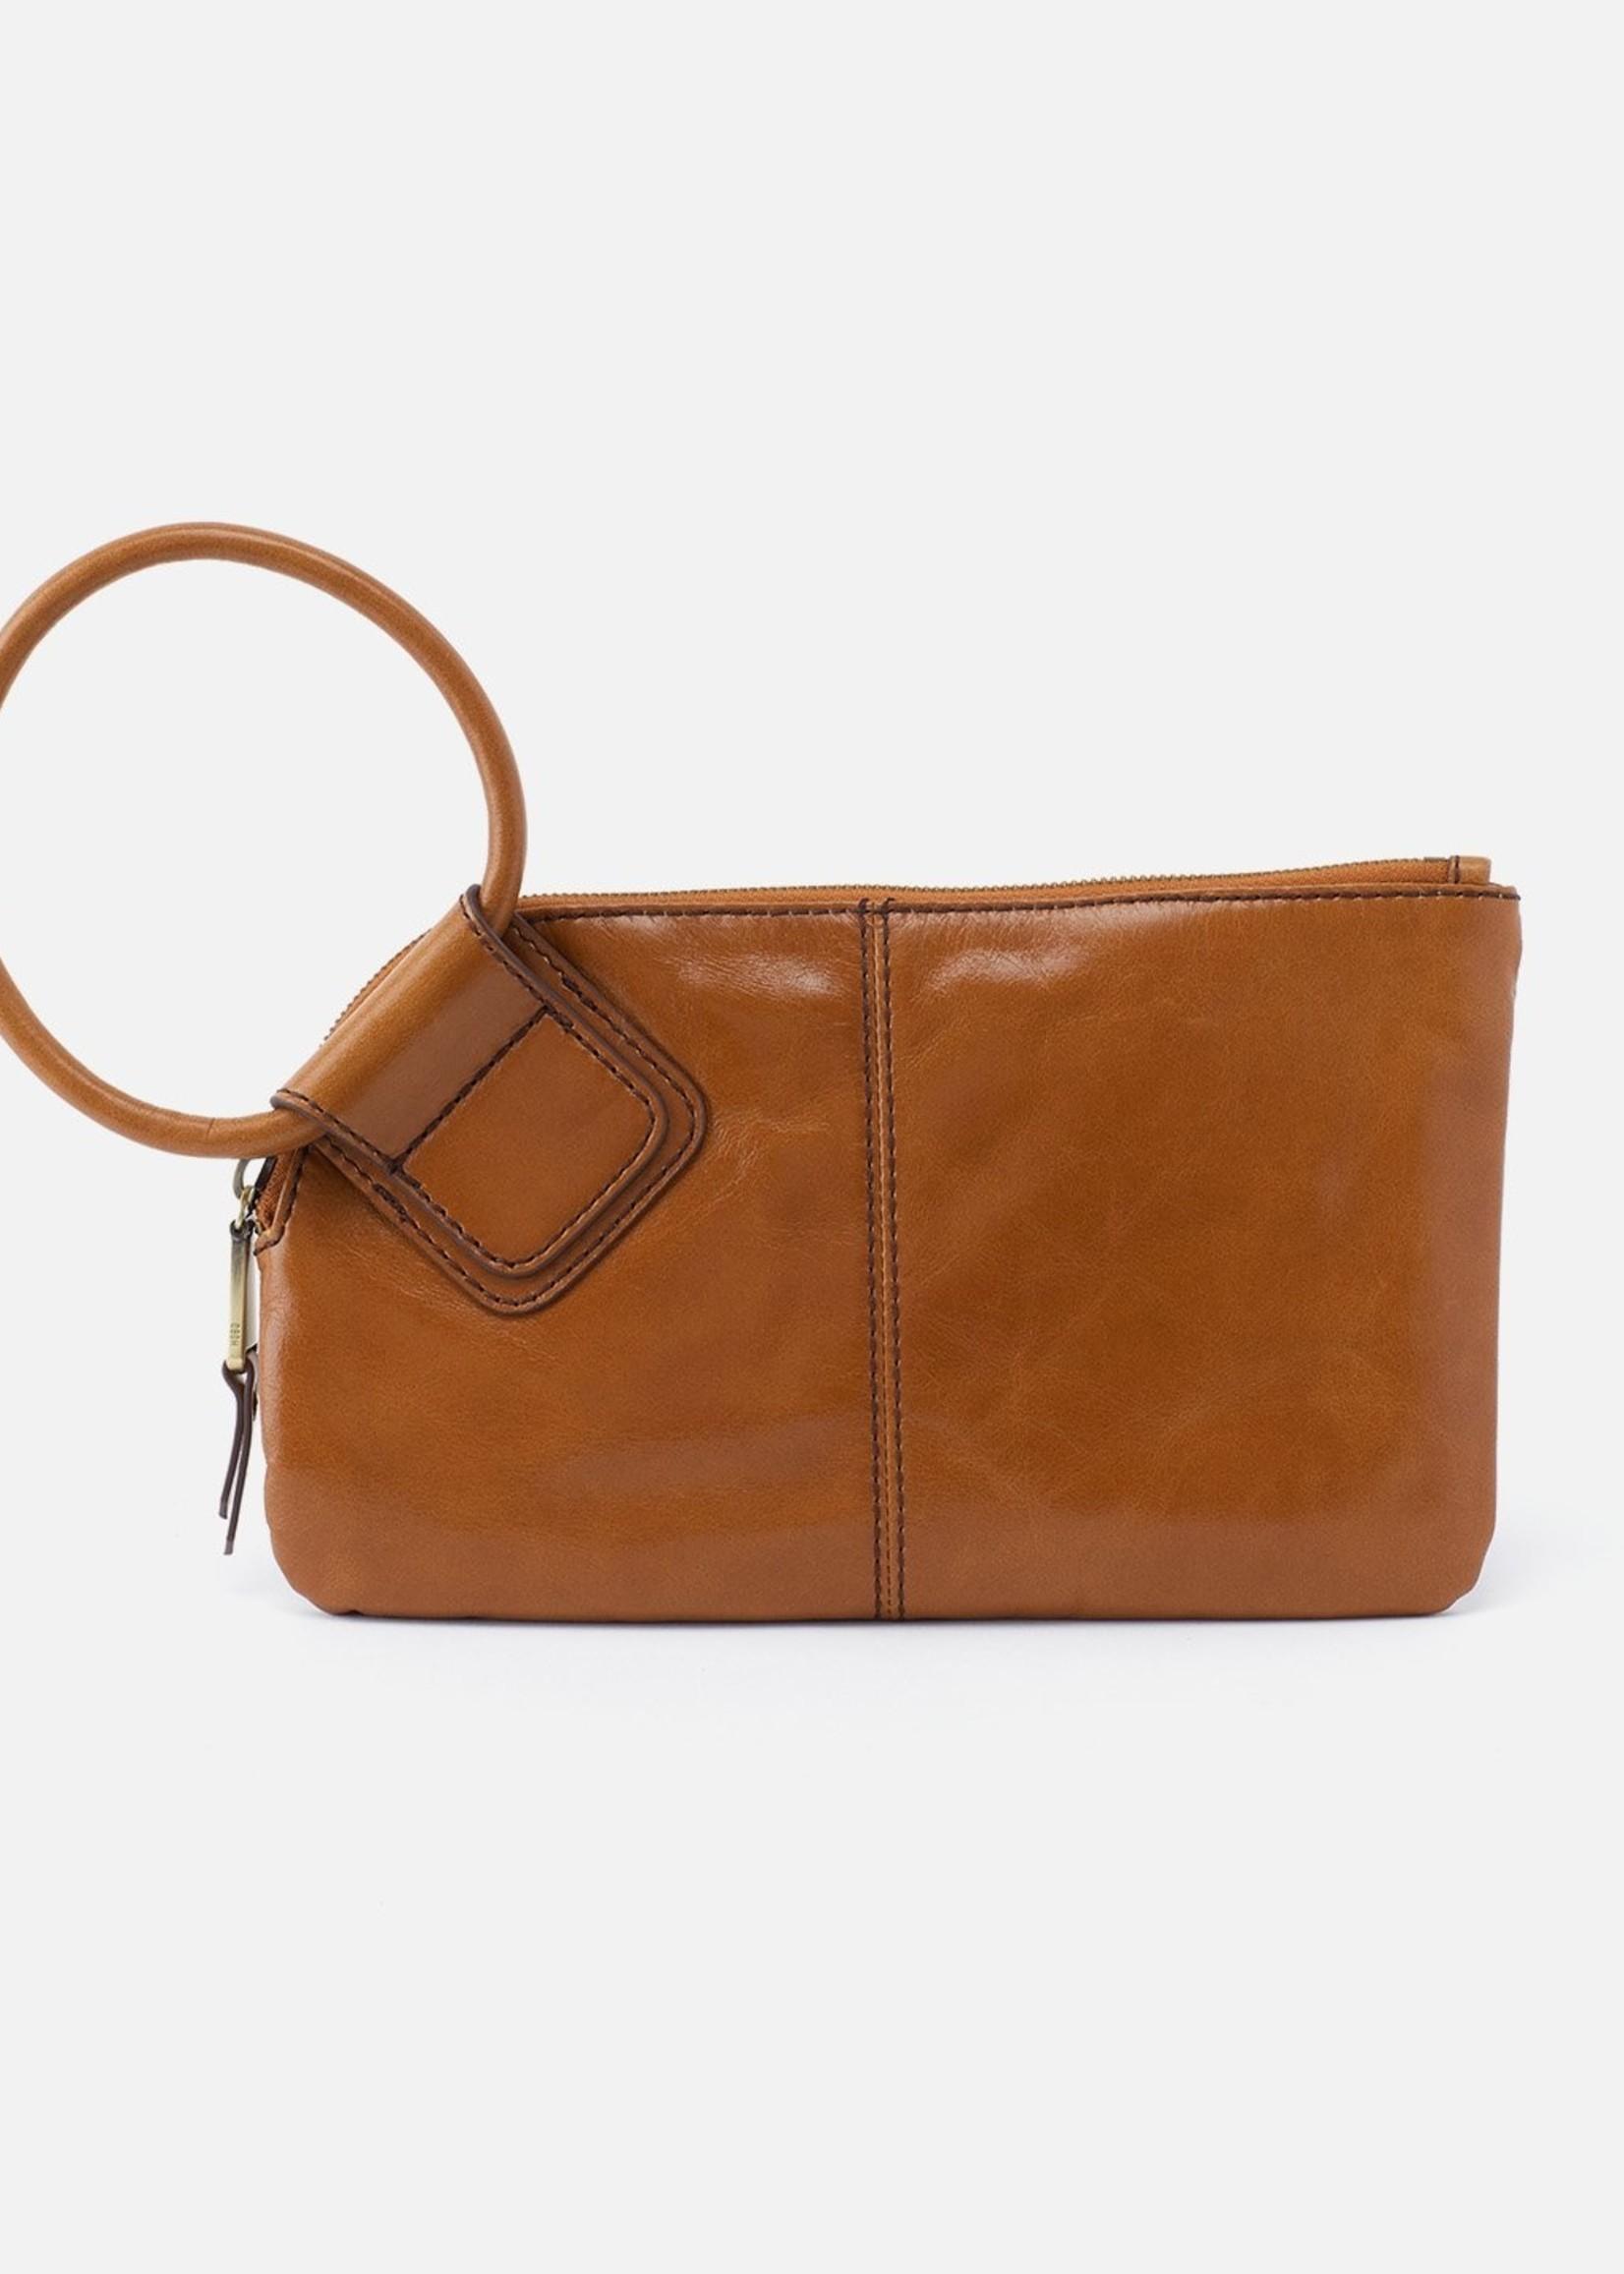 HOBO Bags Sable Wristlet Truffle